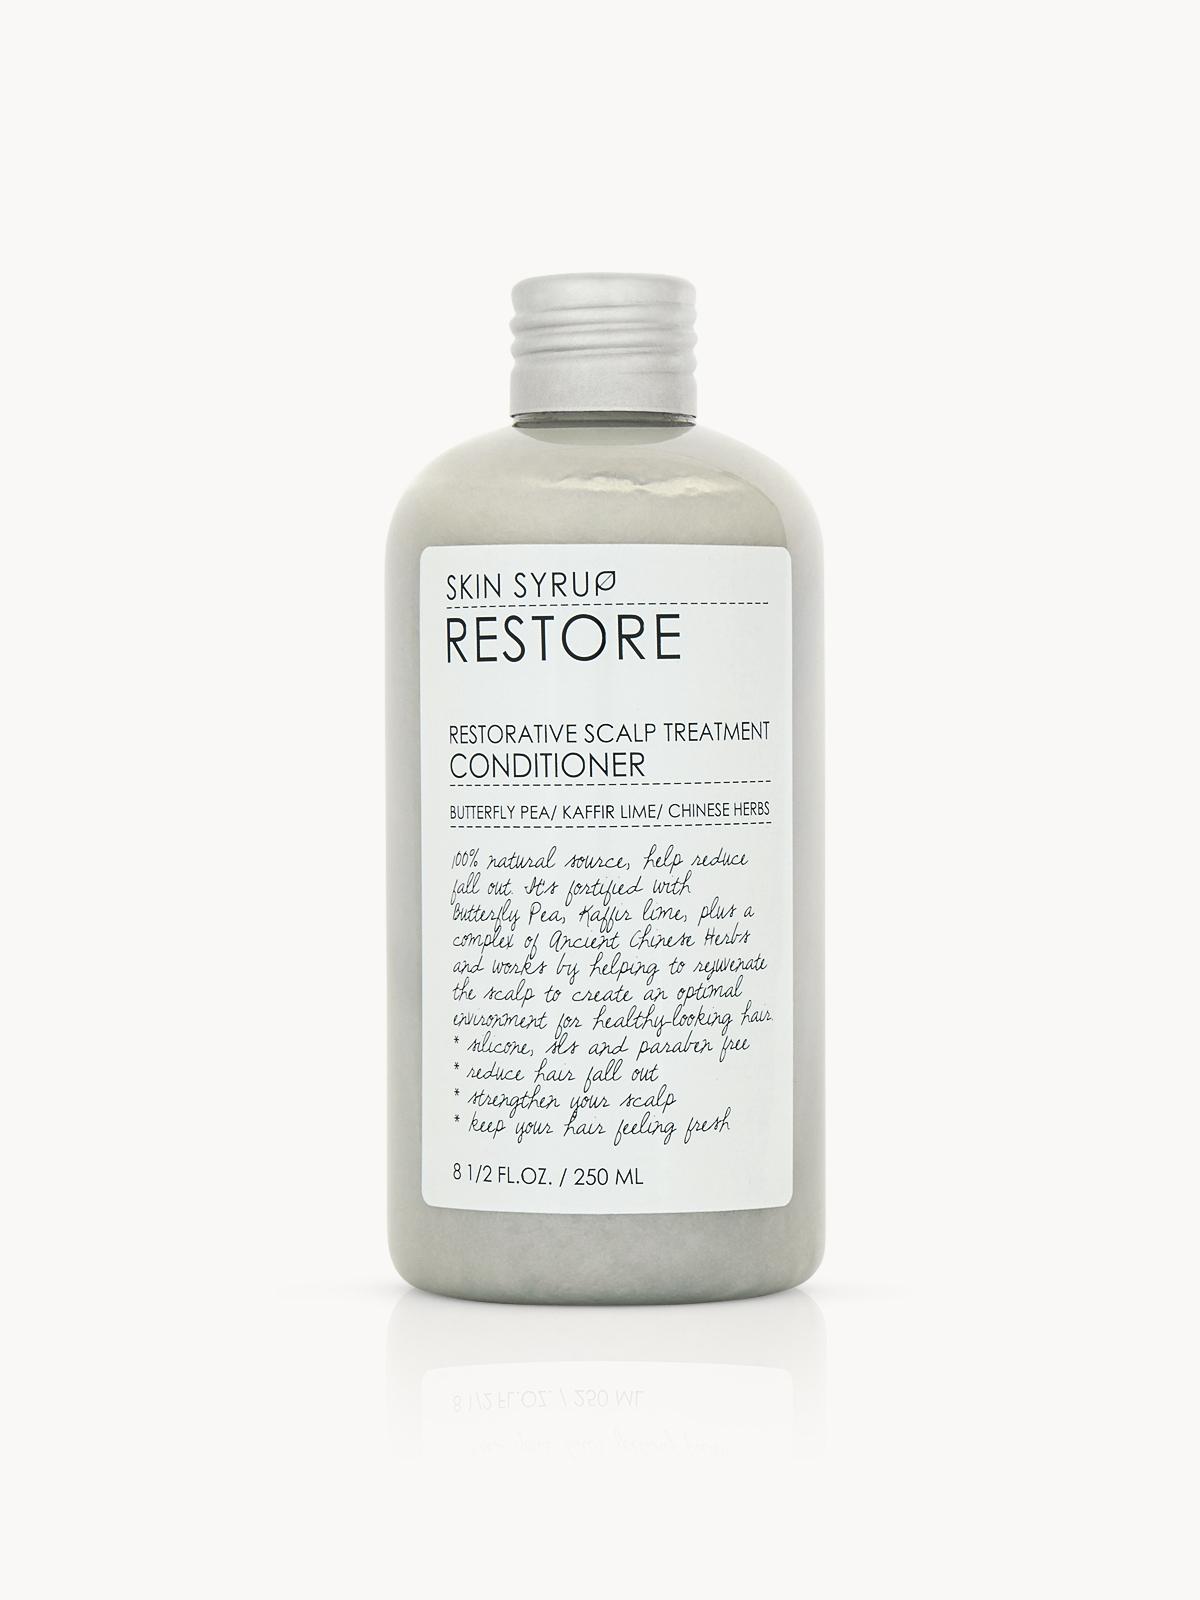 Skin Syrup Restorative Scalp Treatment Conditioner